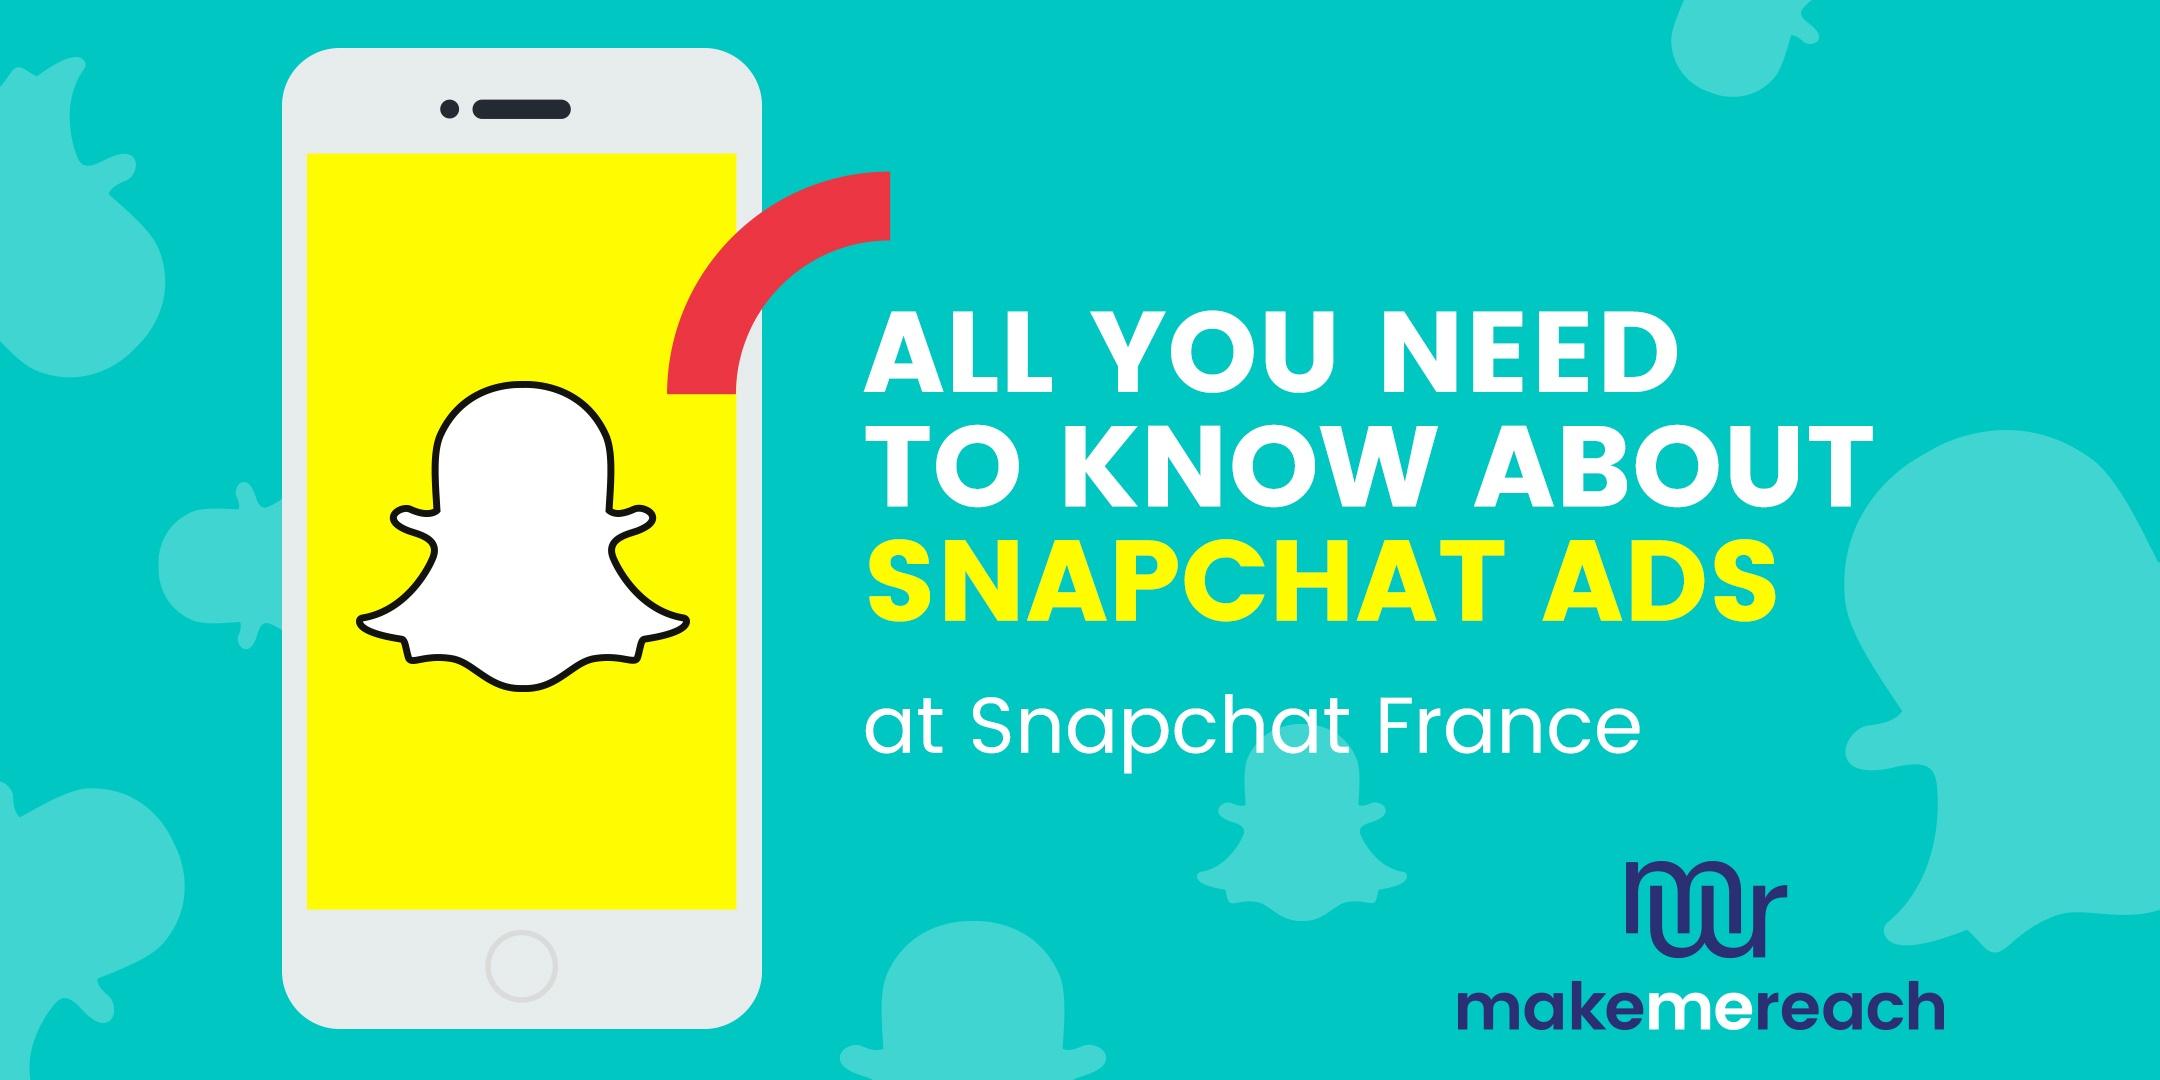 MMR_Workshop_Snapchat_2160x1080_Header.jpg